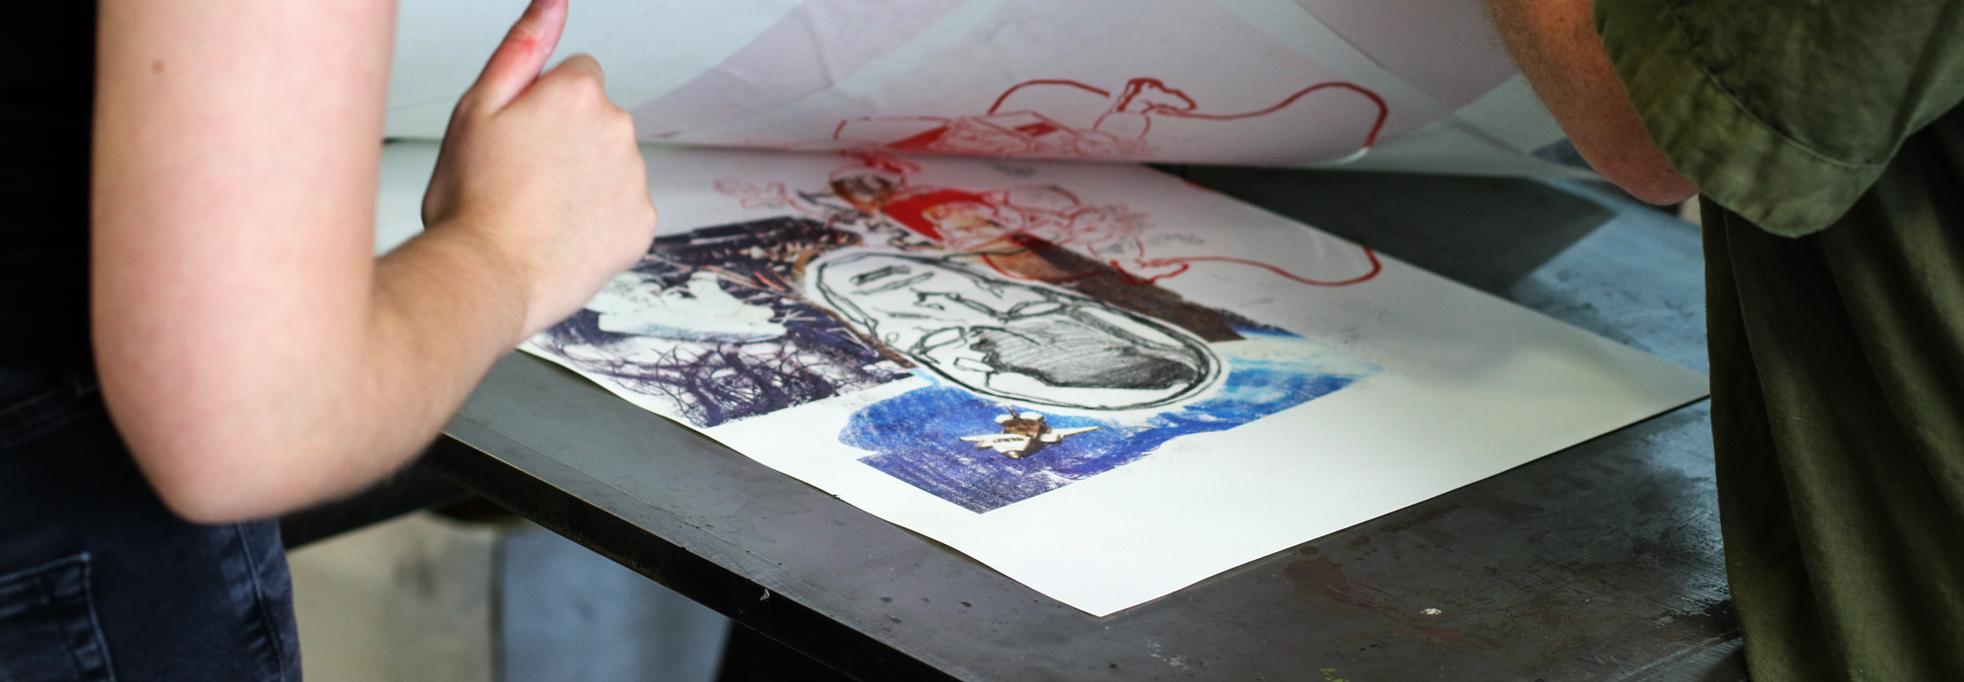 Printmaking - Open workshop